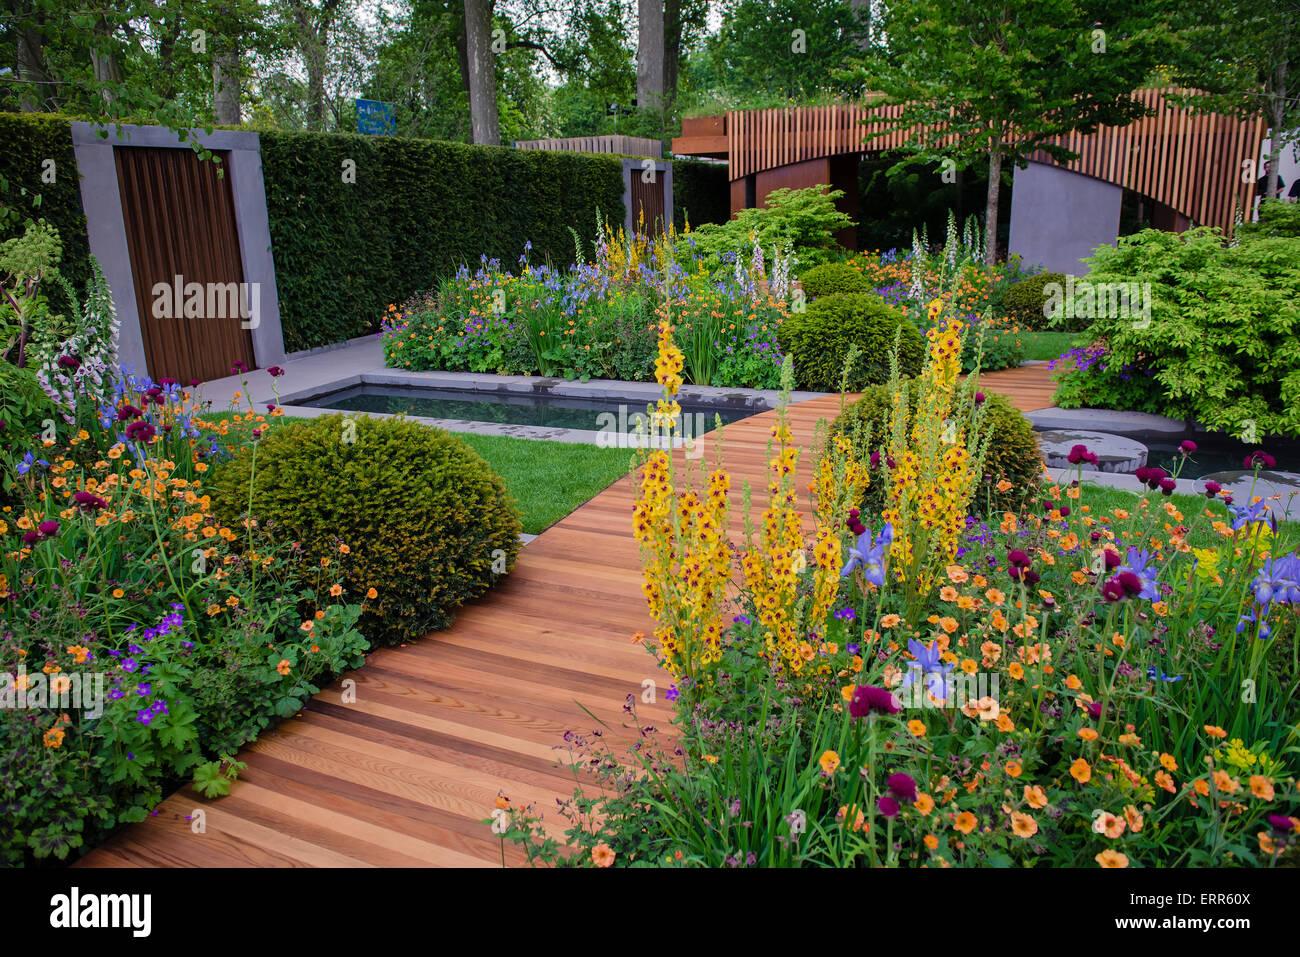 The Homebase Garden - Urban Retreat by Adam Frost, gold award